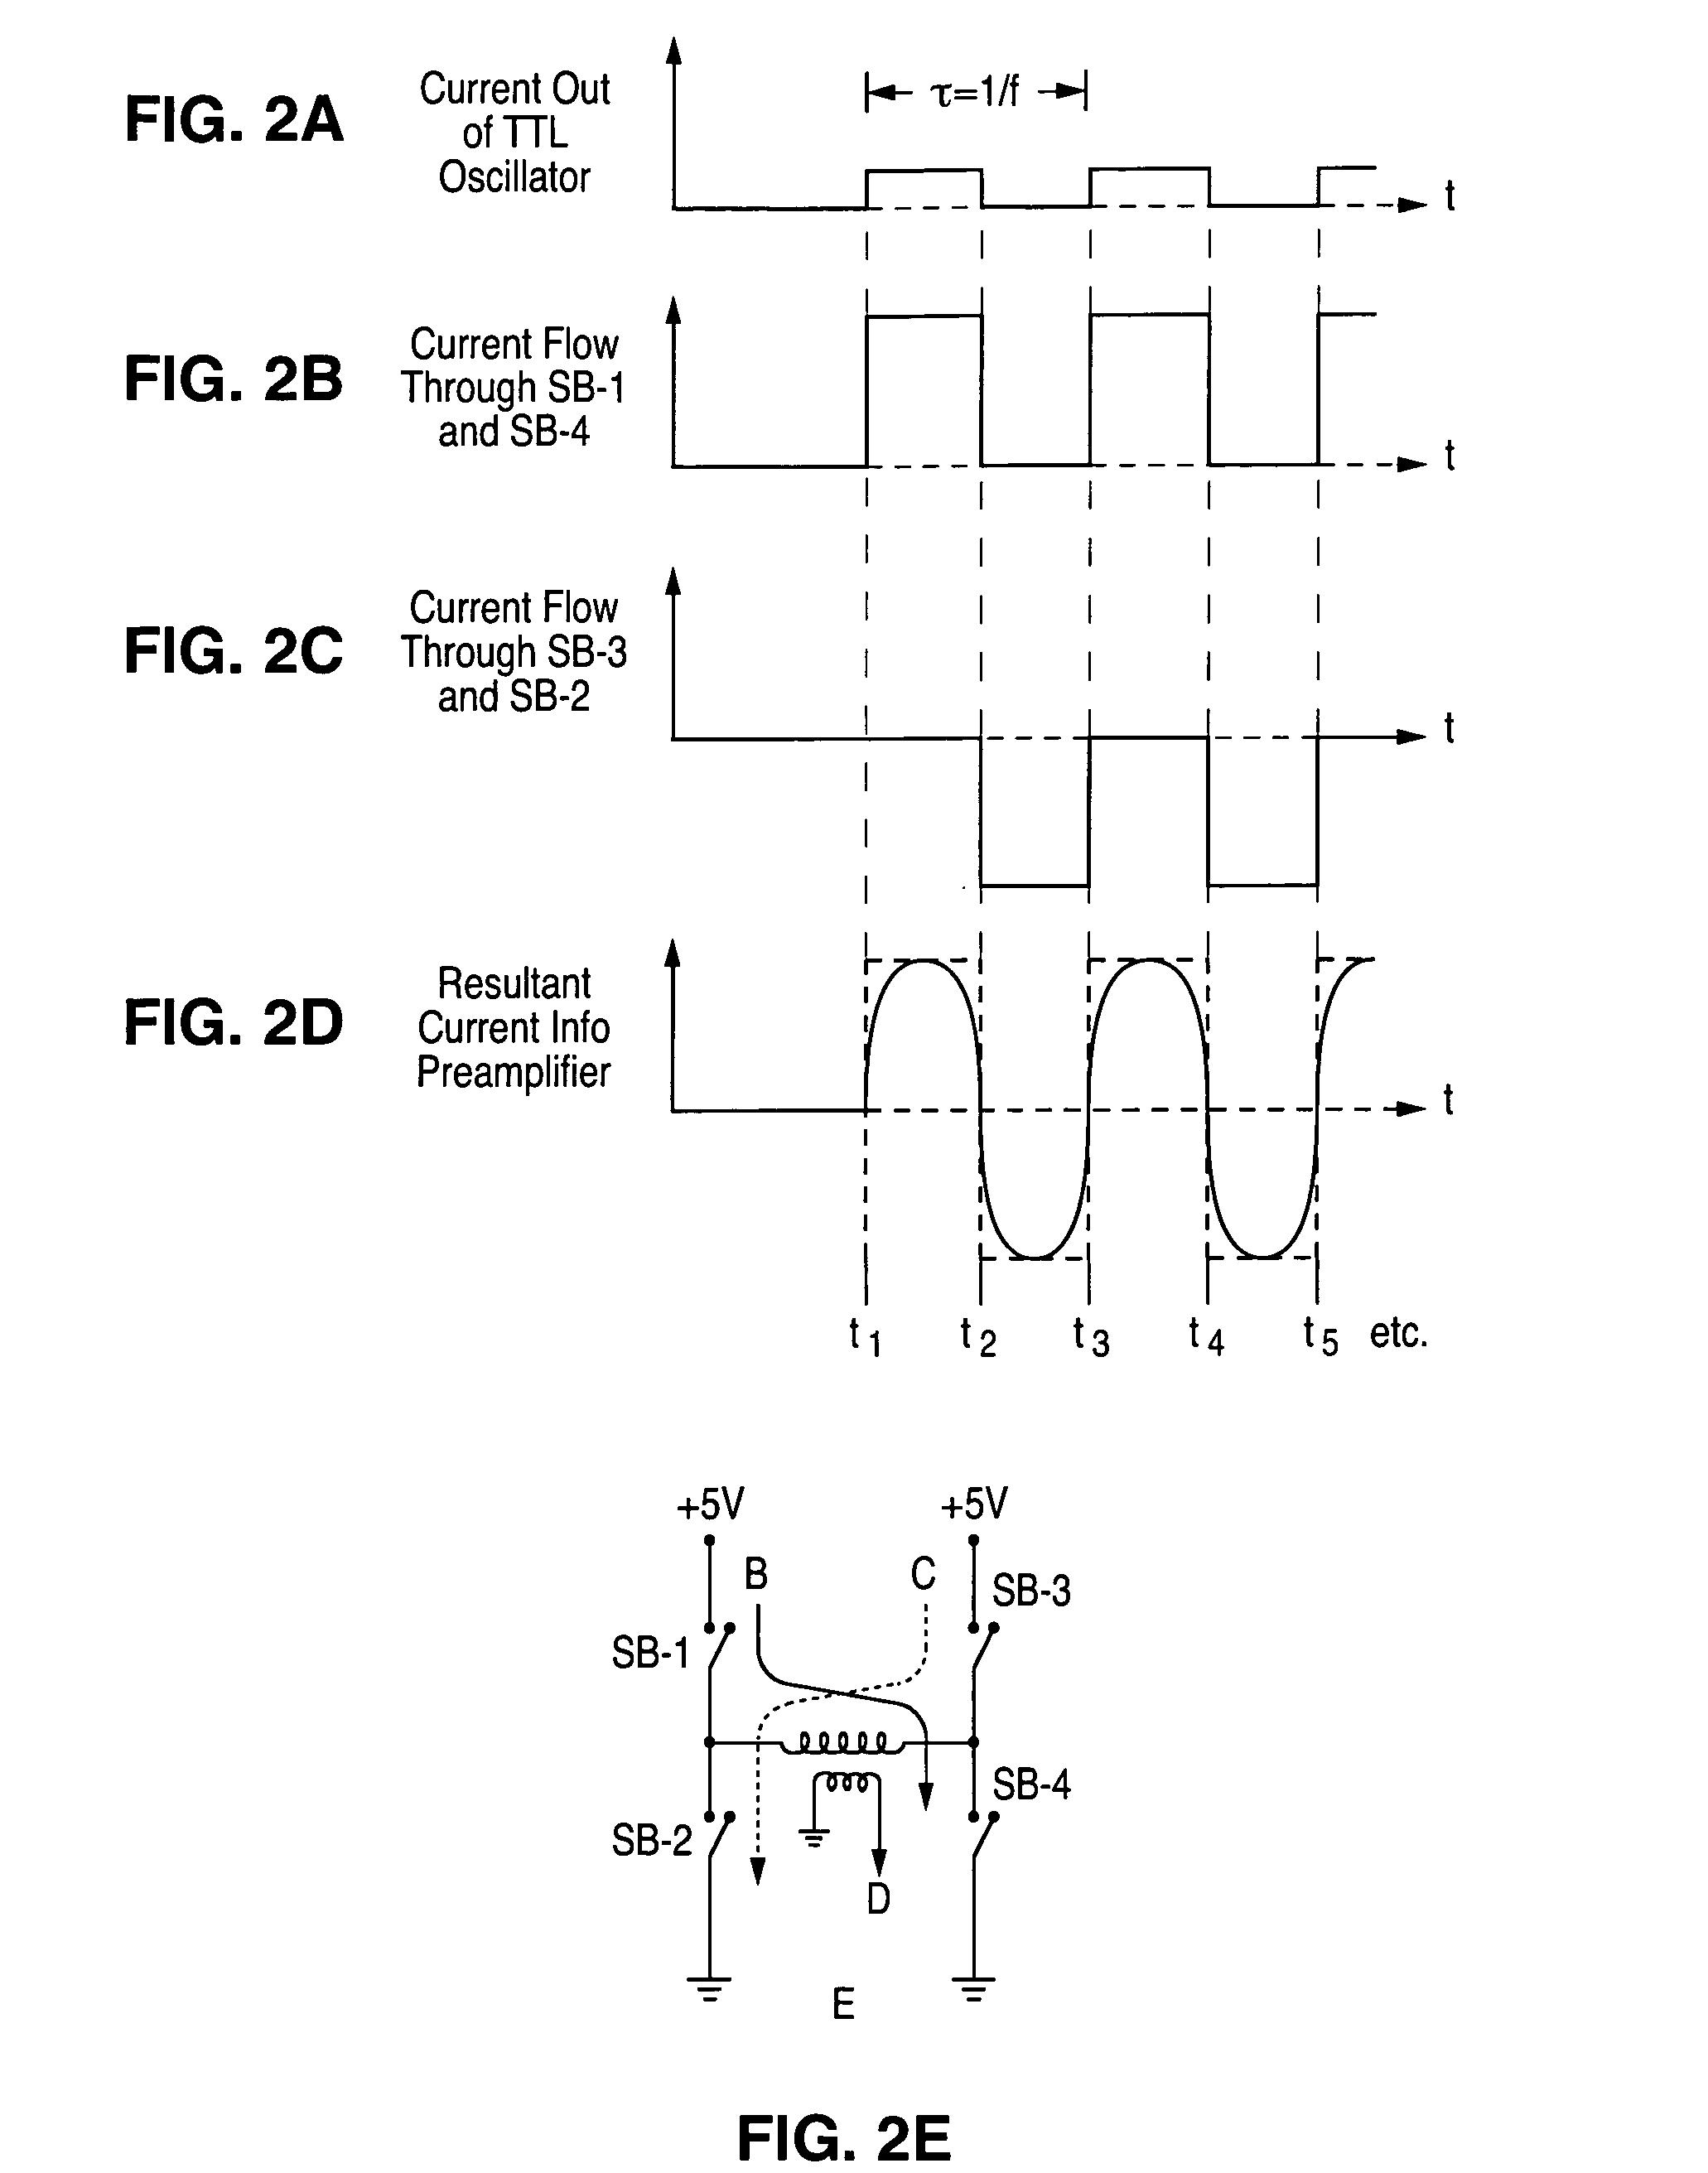 Brevet Us20070031156 Amplification Of Ttl Rf Oscillator Signals Pushpull Circuit Oscillatorcircuit Signalprocessing Patent Drawing